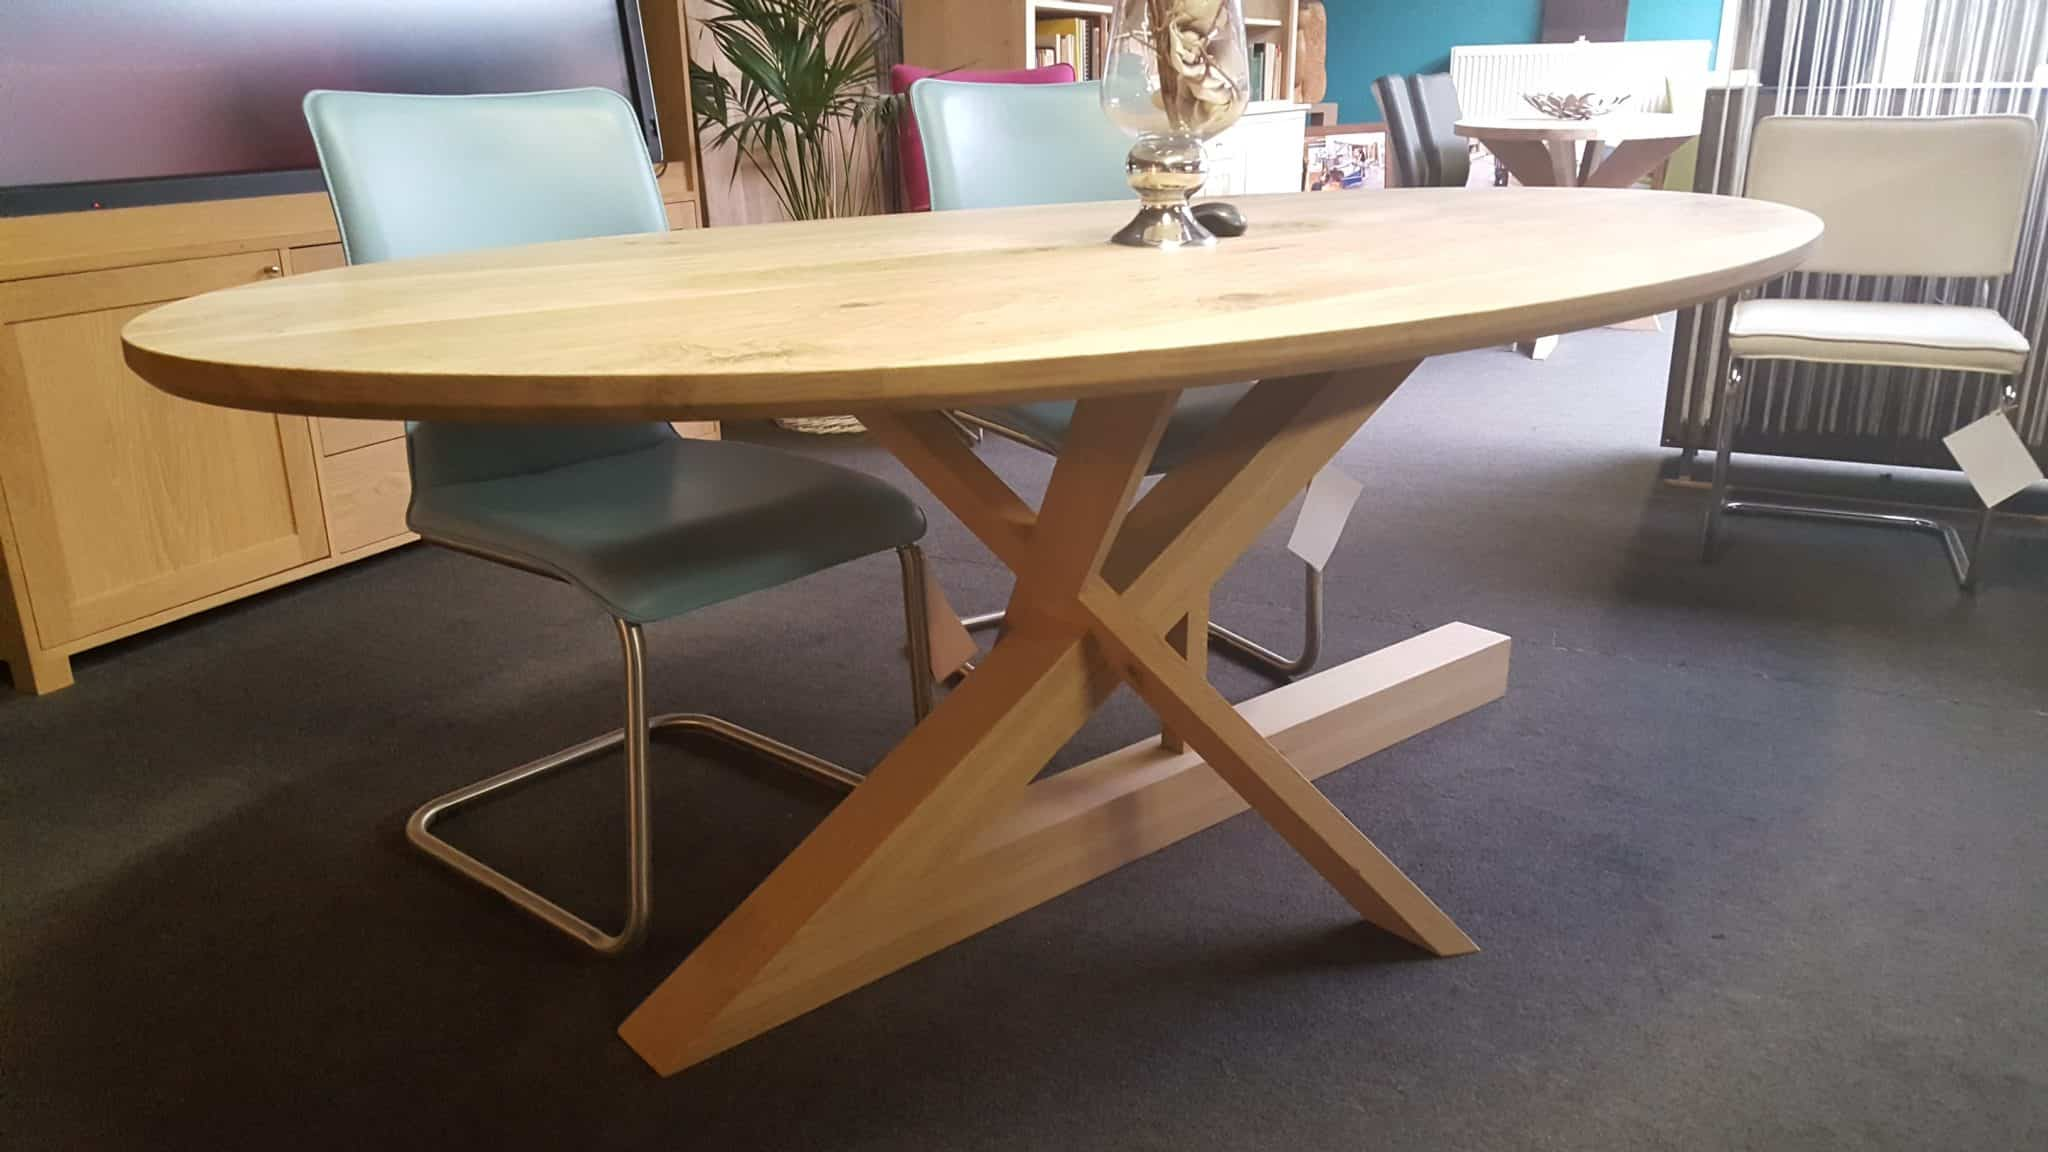 LePierre massief eiken houten design keuken tafel 2